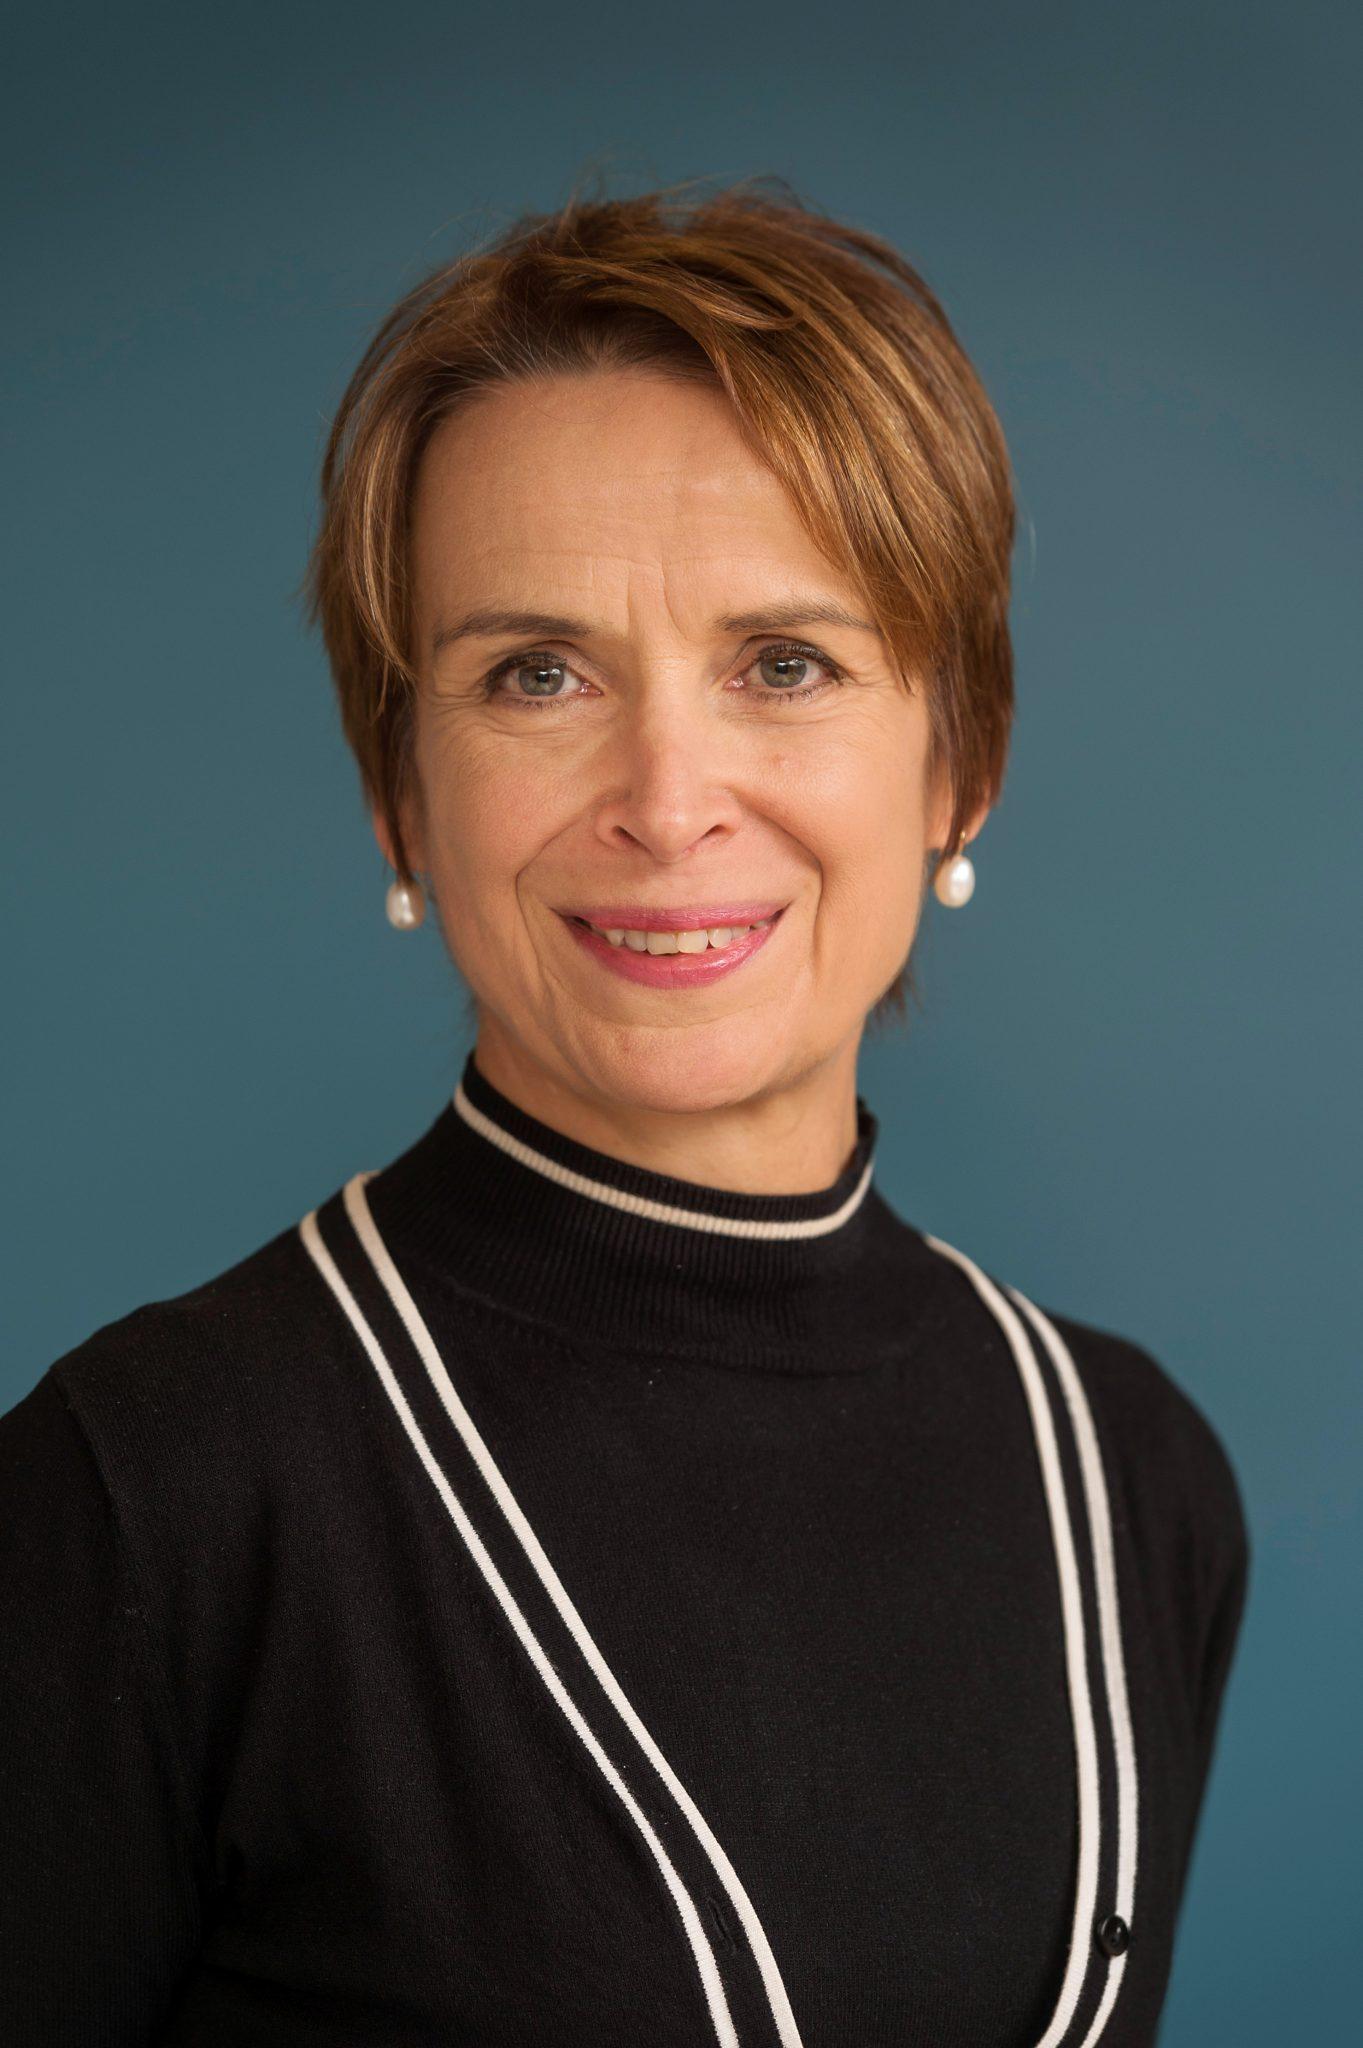 Elaine Crichton